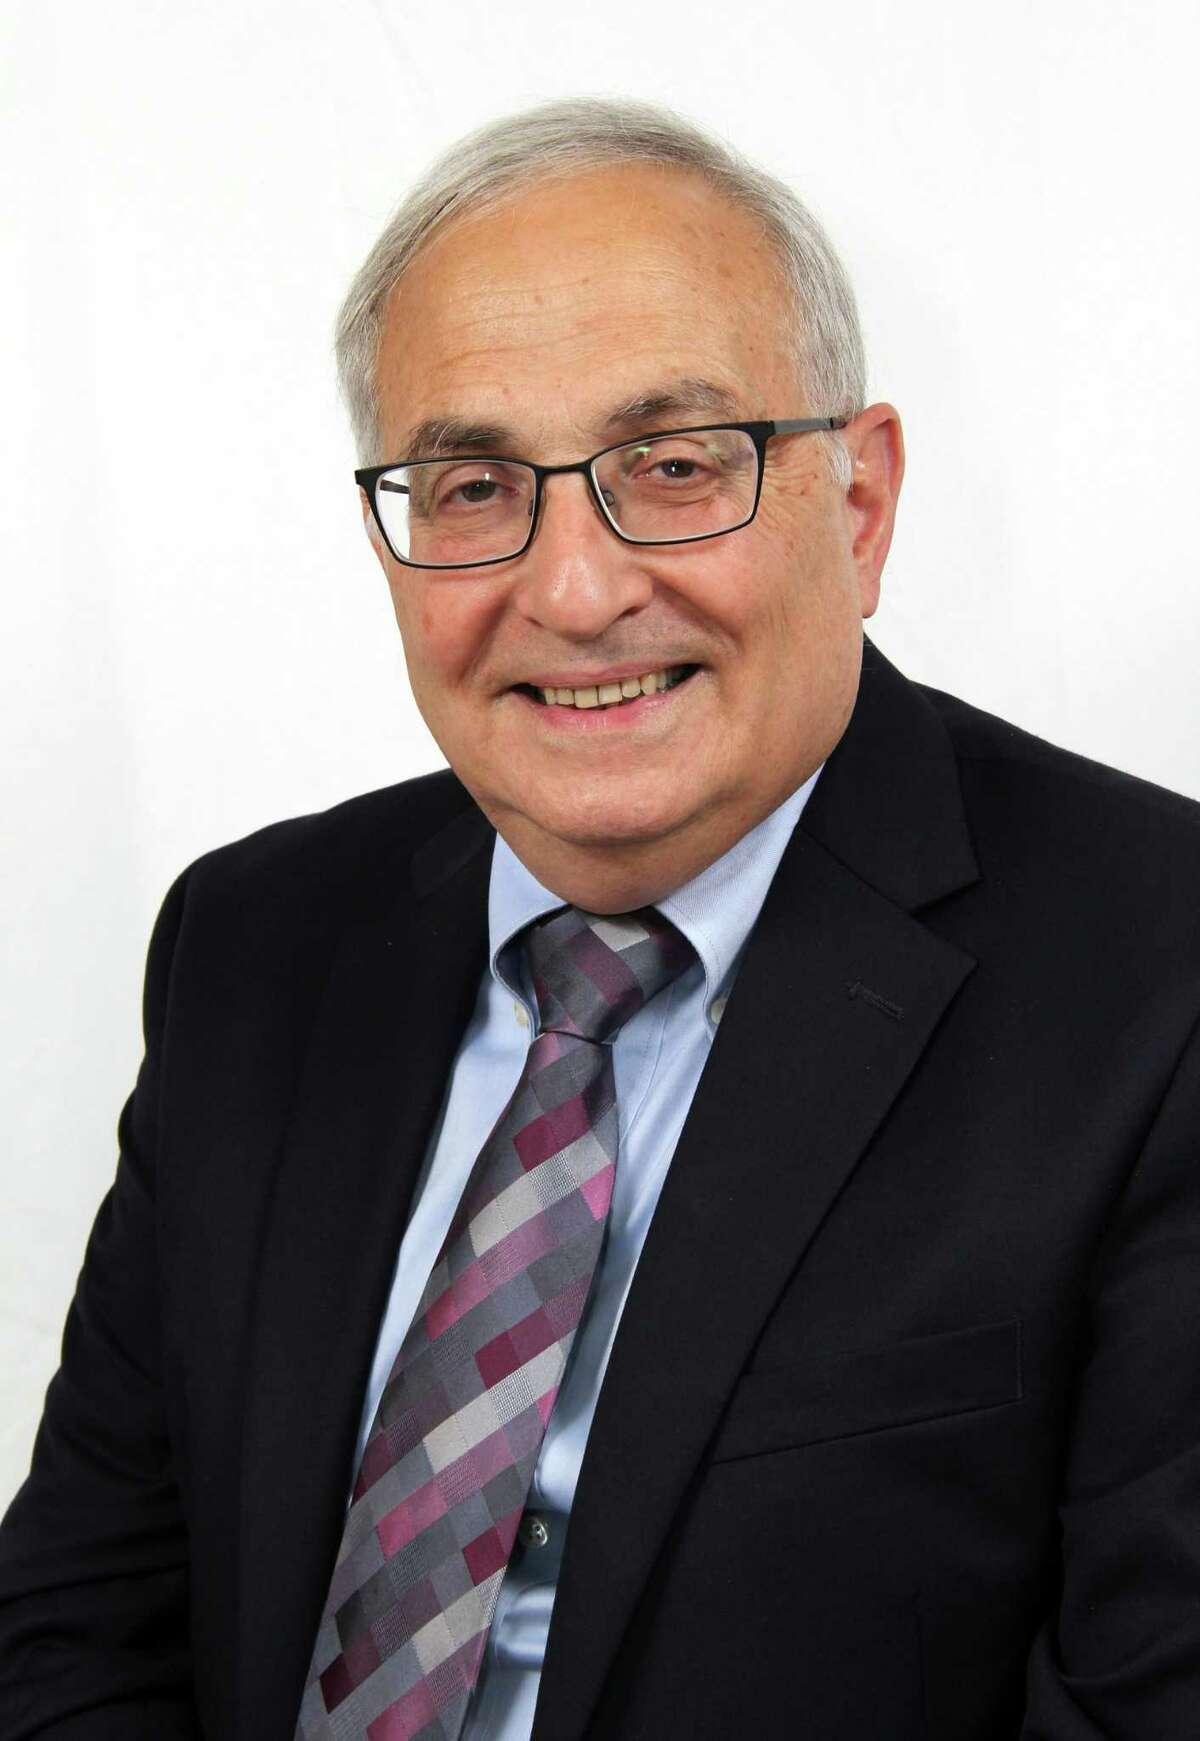 Bethel Zoning Board of Appeals candidate Stanley Kessler